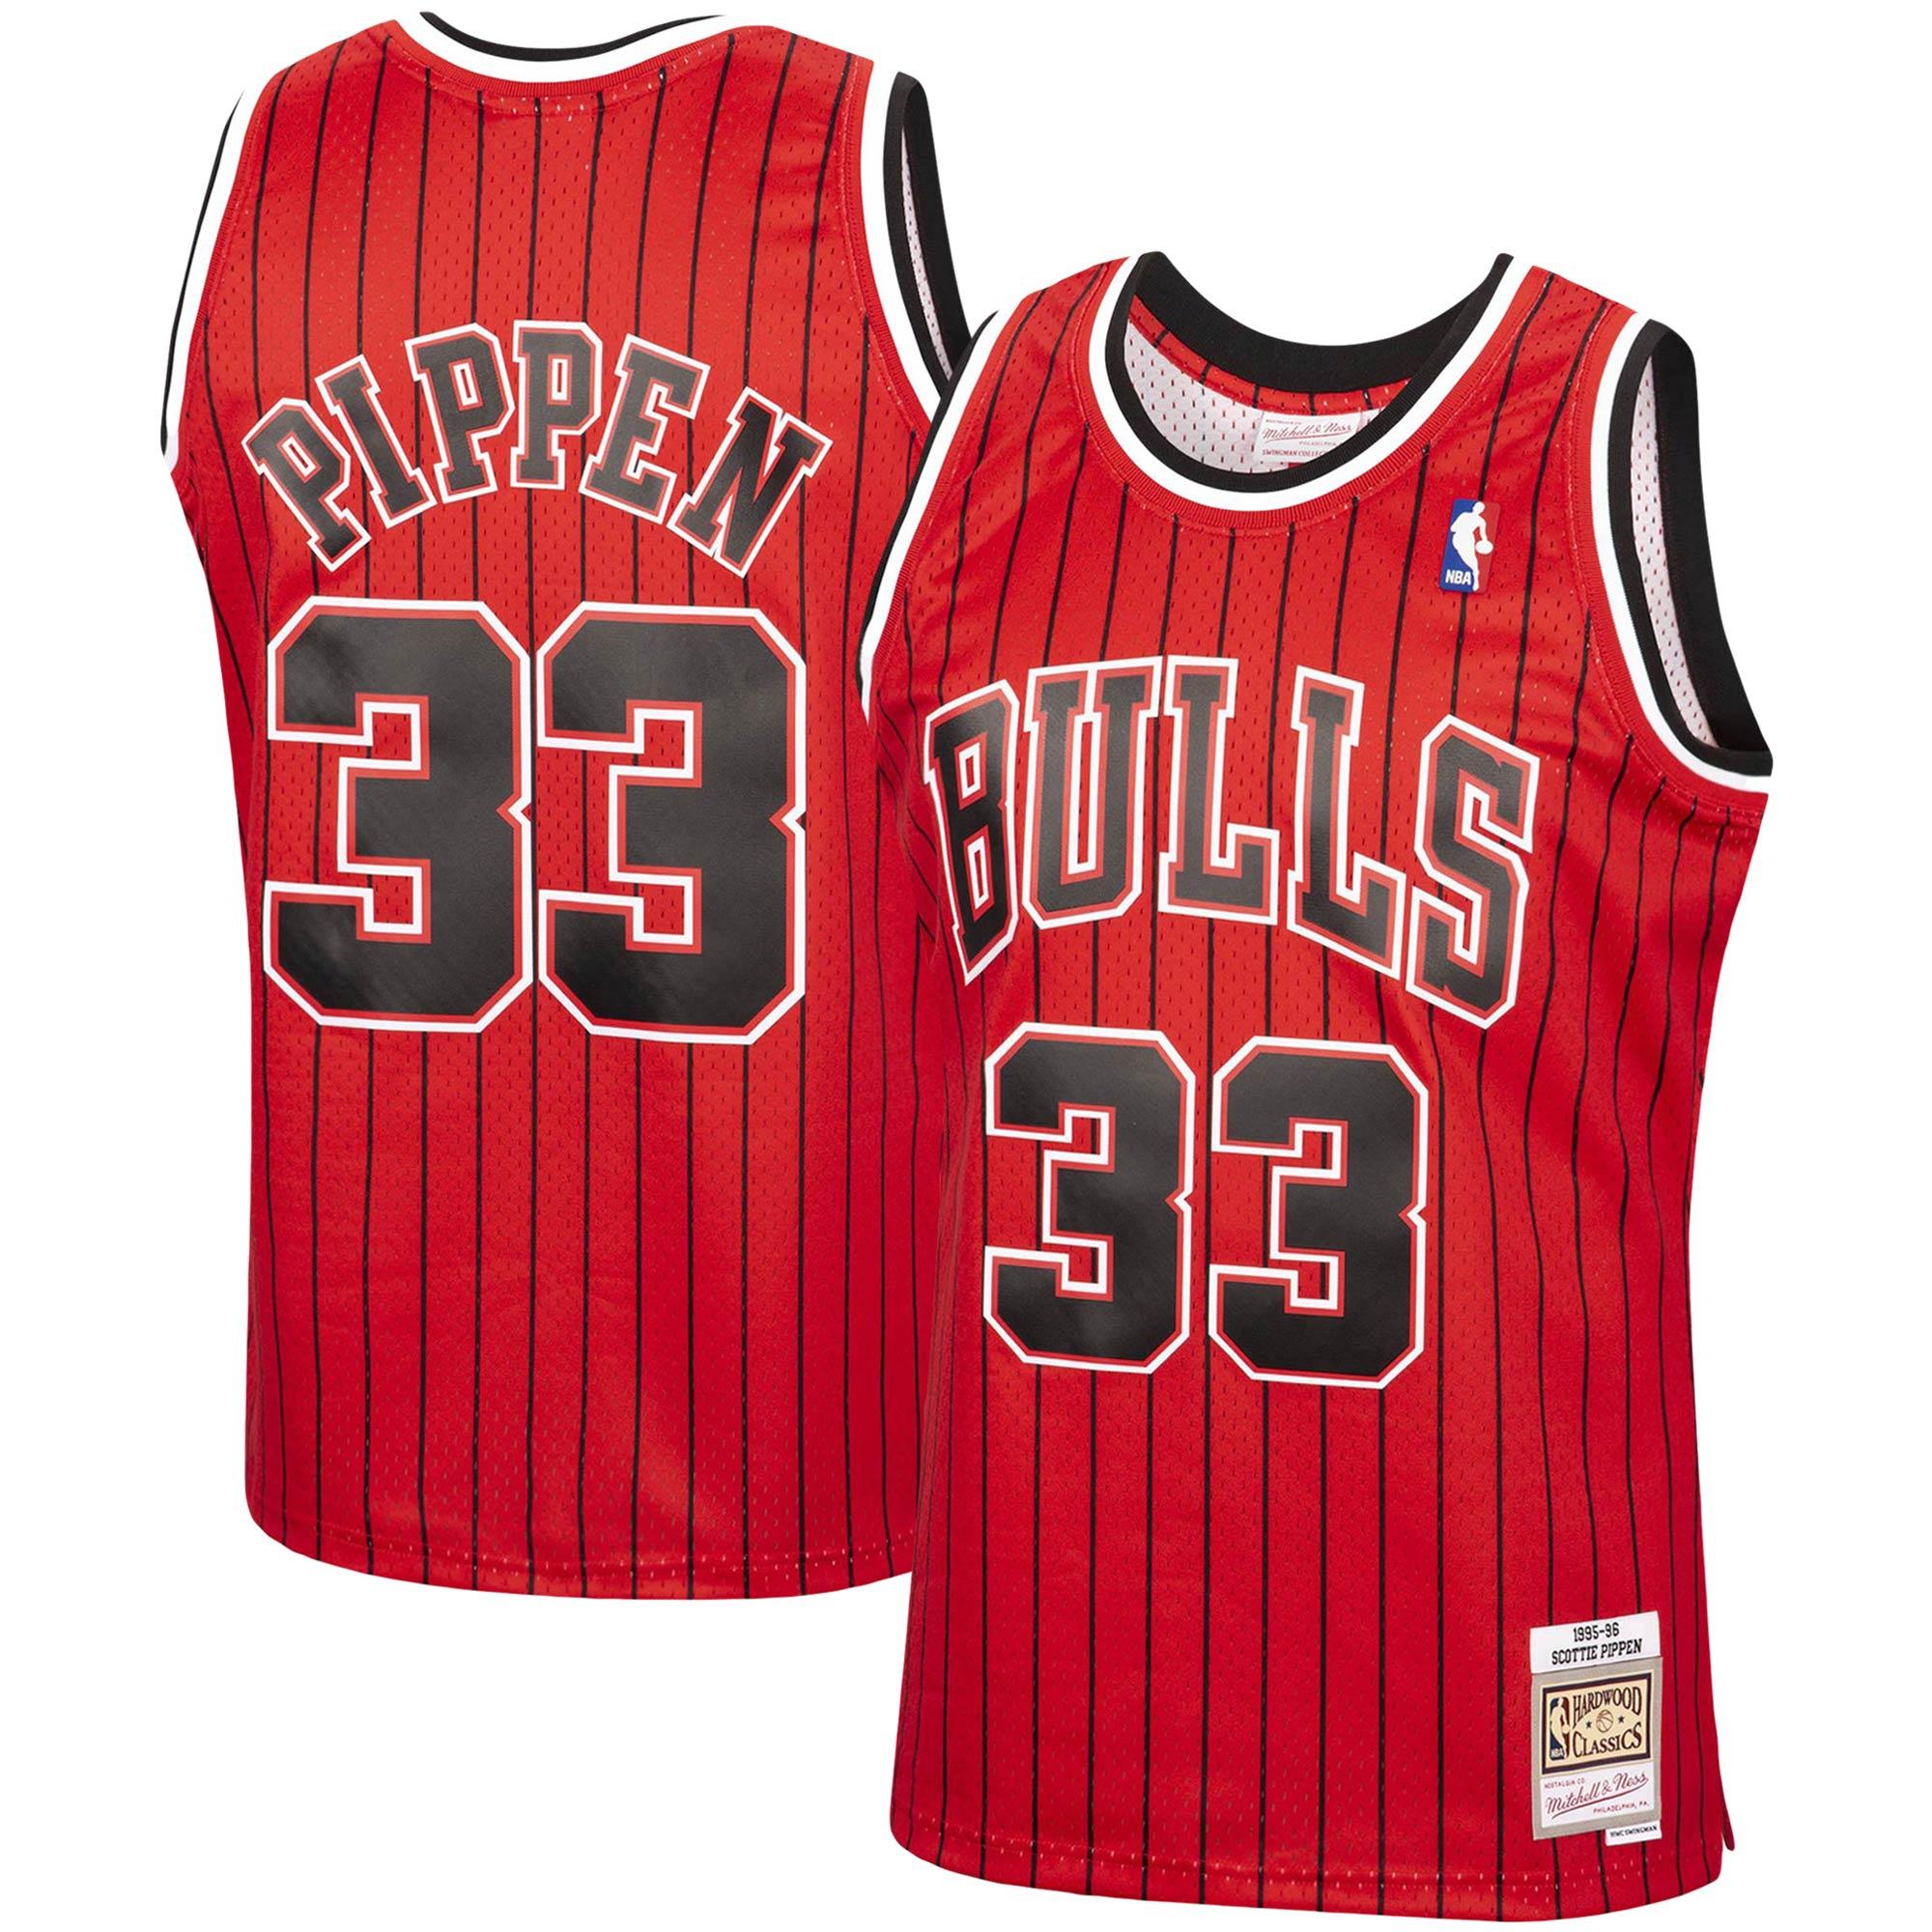 Scottie Pippen Chicago Bulls Mitchell & Ness 1995-96 Hardwood Classics Reload Swingman Jersey - Red